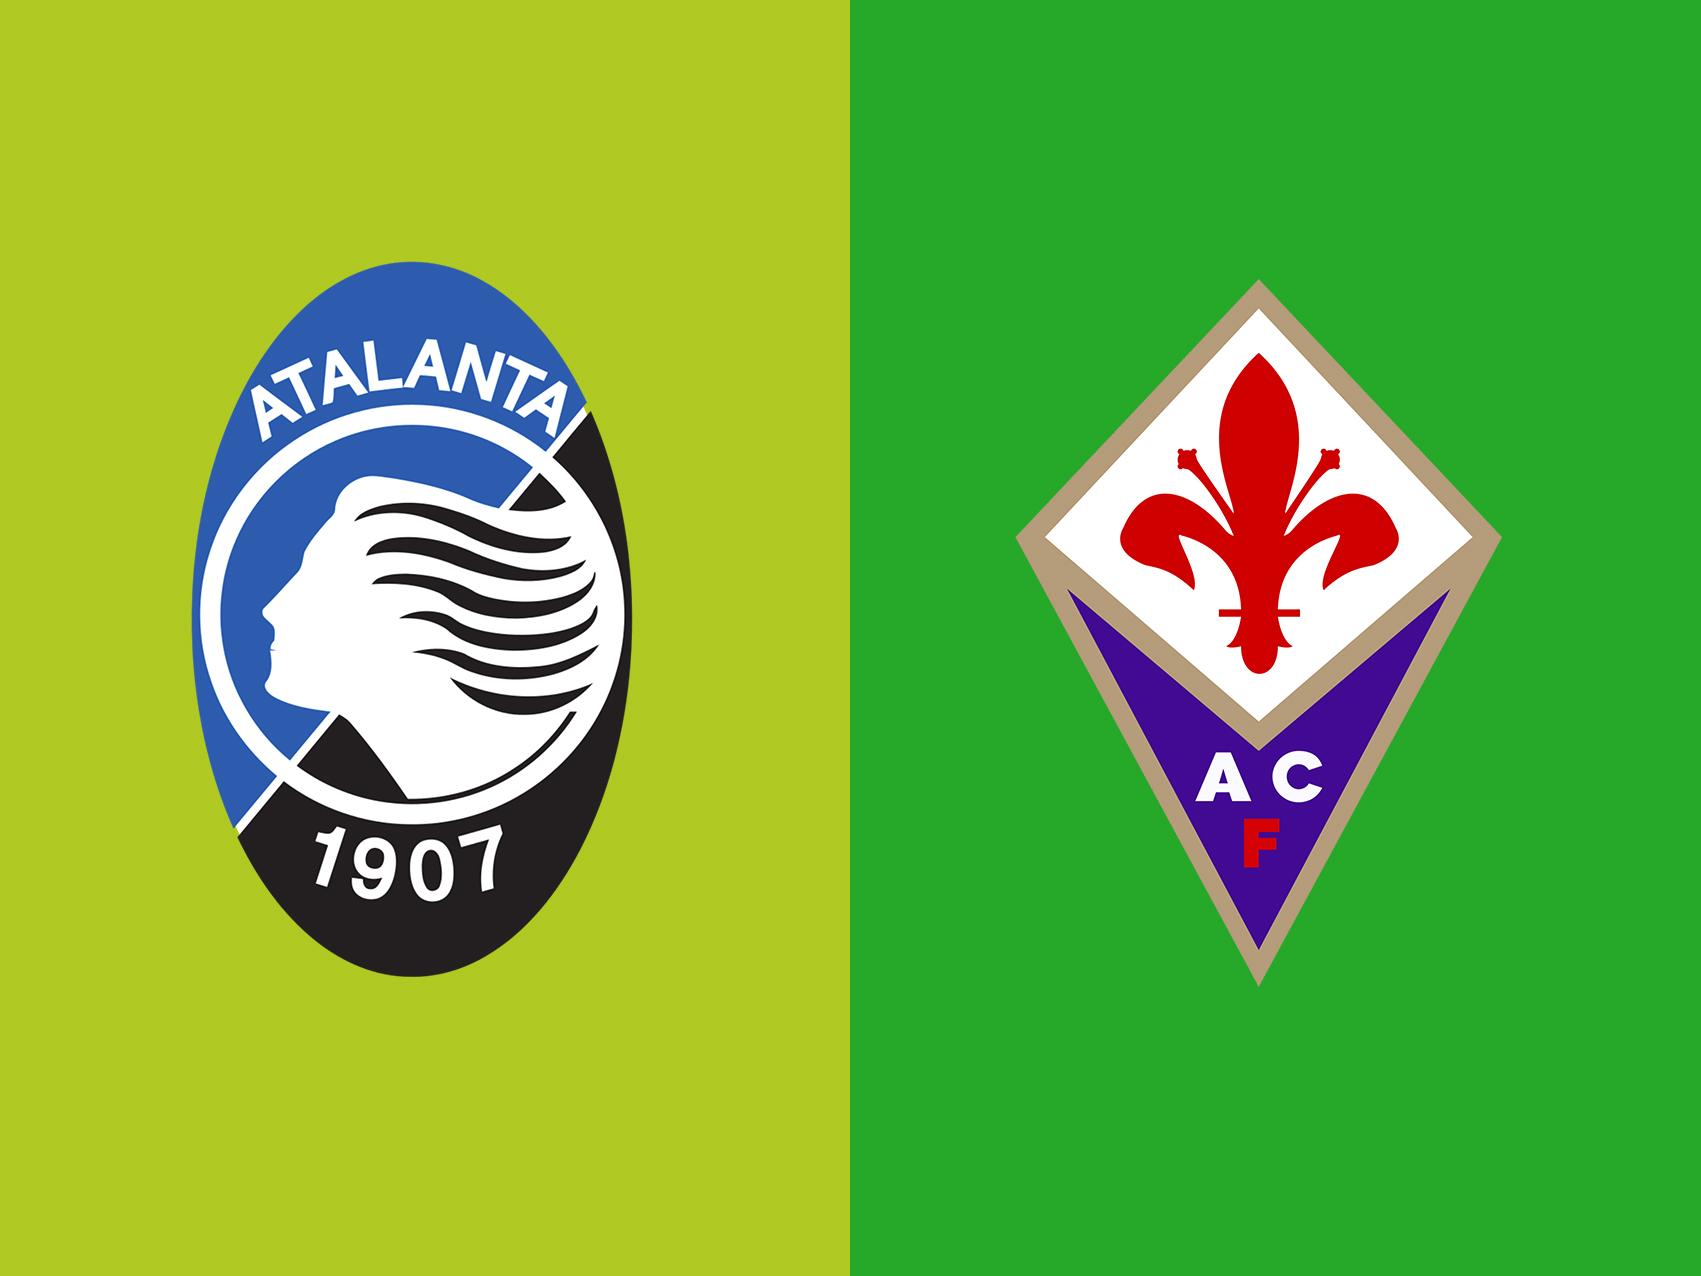 soi-keo-ca-cuoc-bong-da-ngay-26-4-slavia-praha-vs-Fiorentina-cong-pha-phao-dai-b9 1